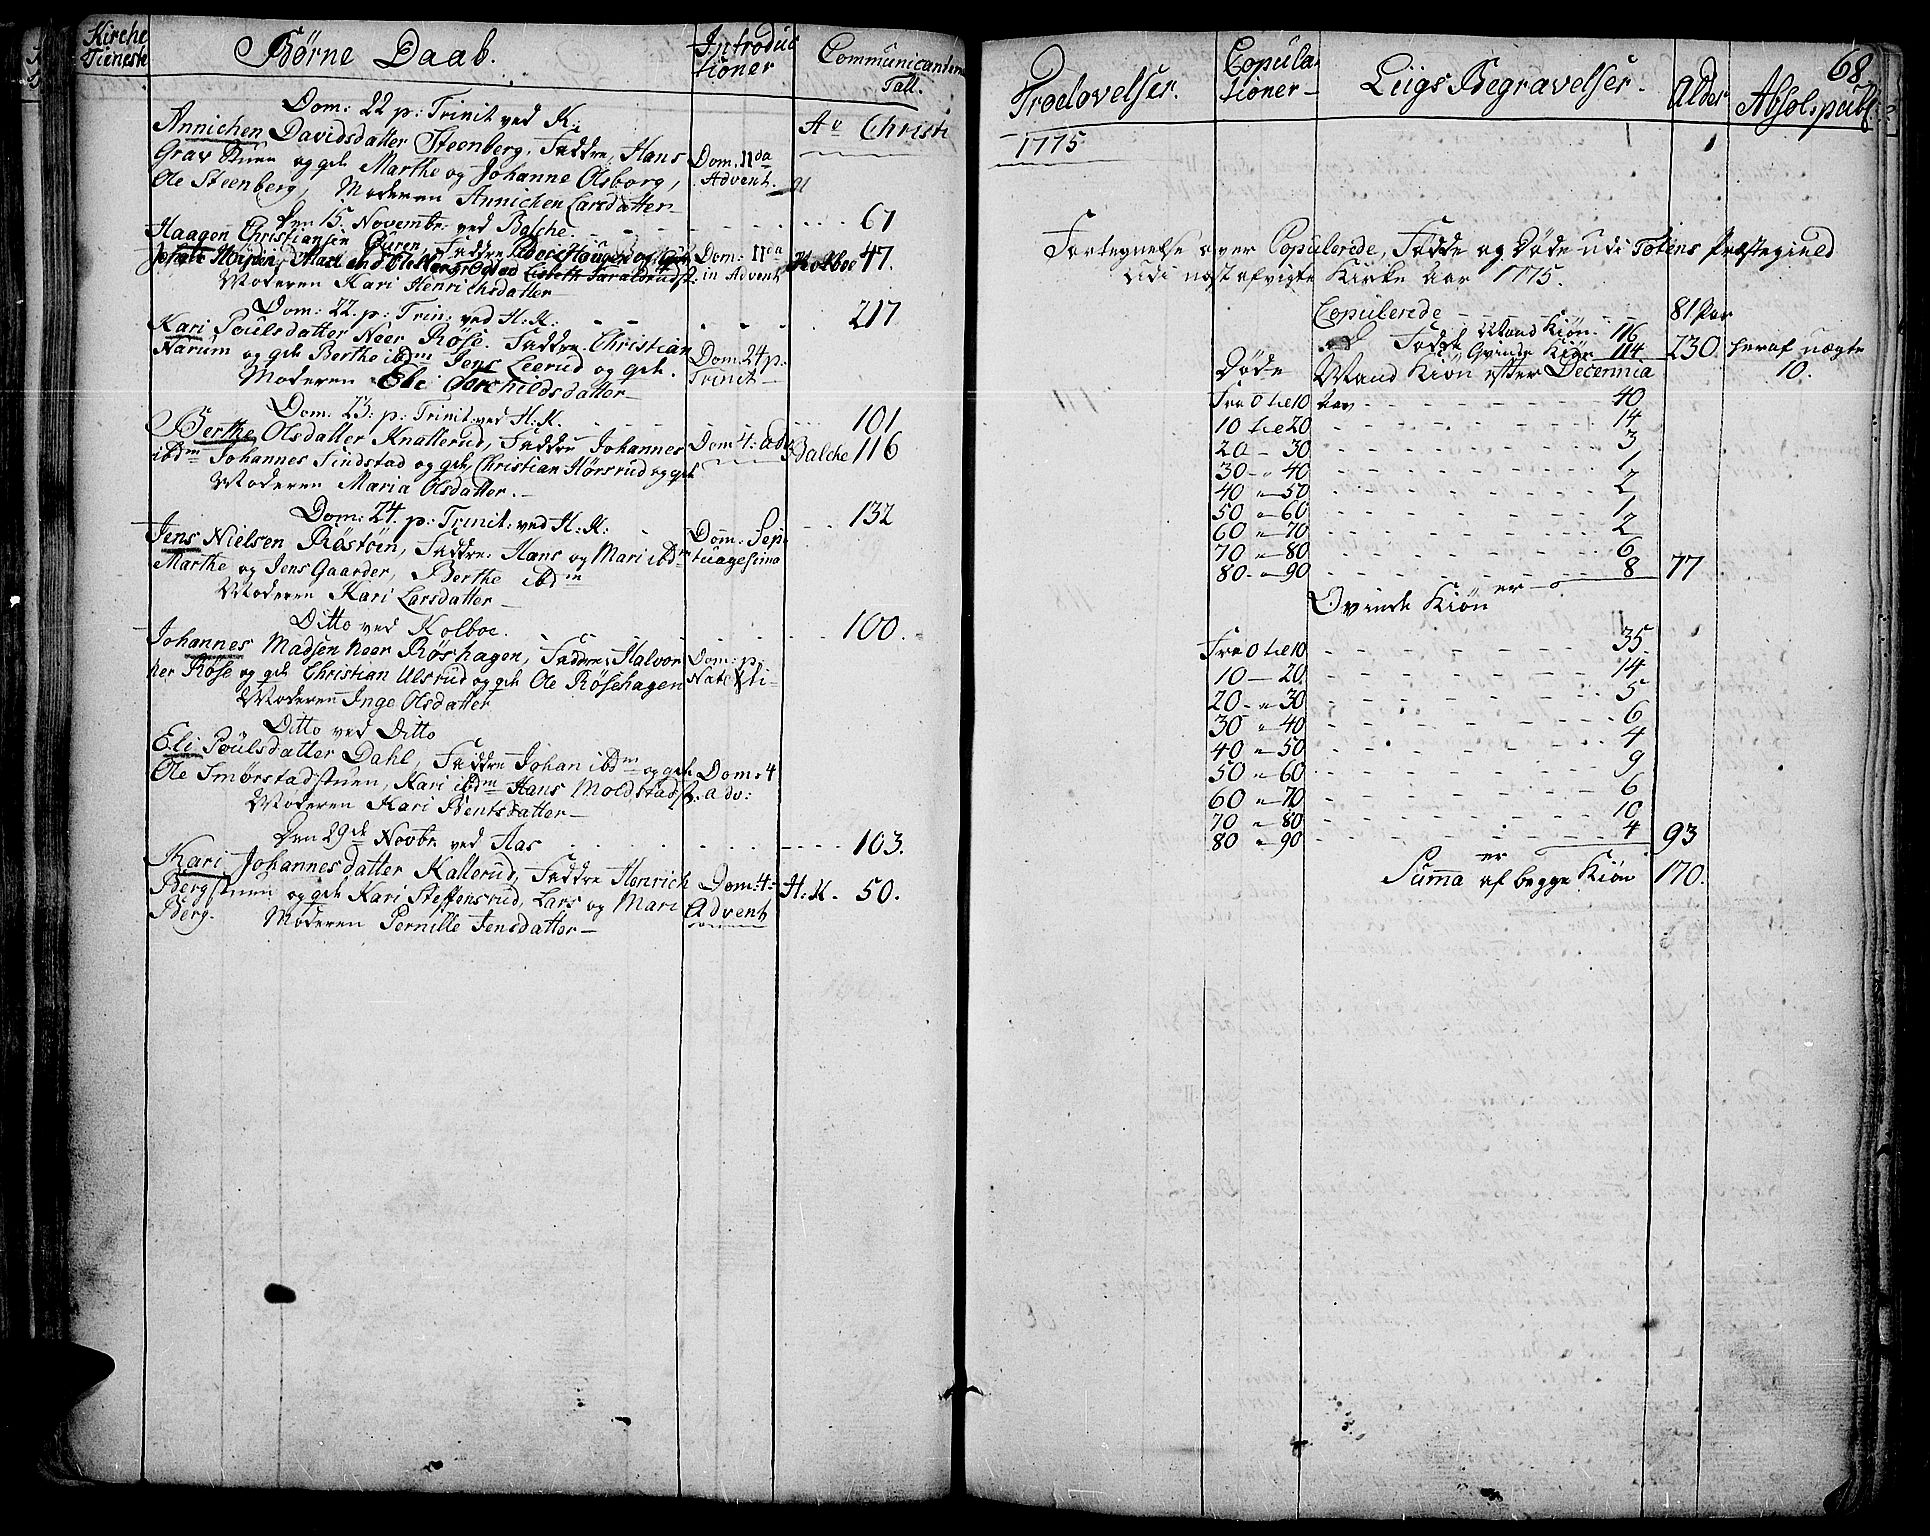 SAH, Toten prestekontor, Ministerialbok nr. 6, 1773-1793, s. 68